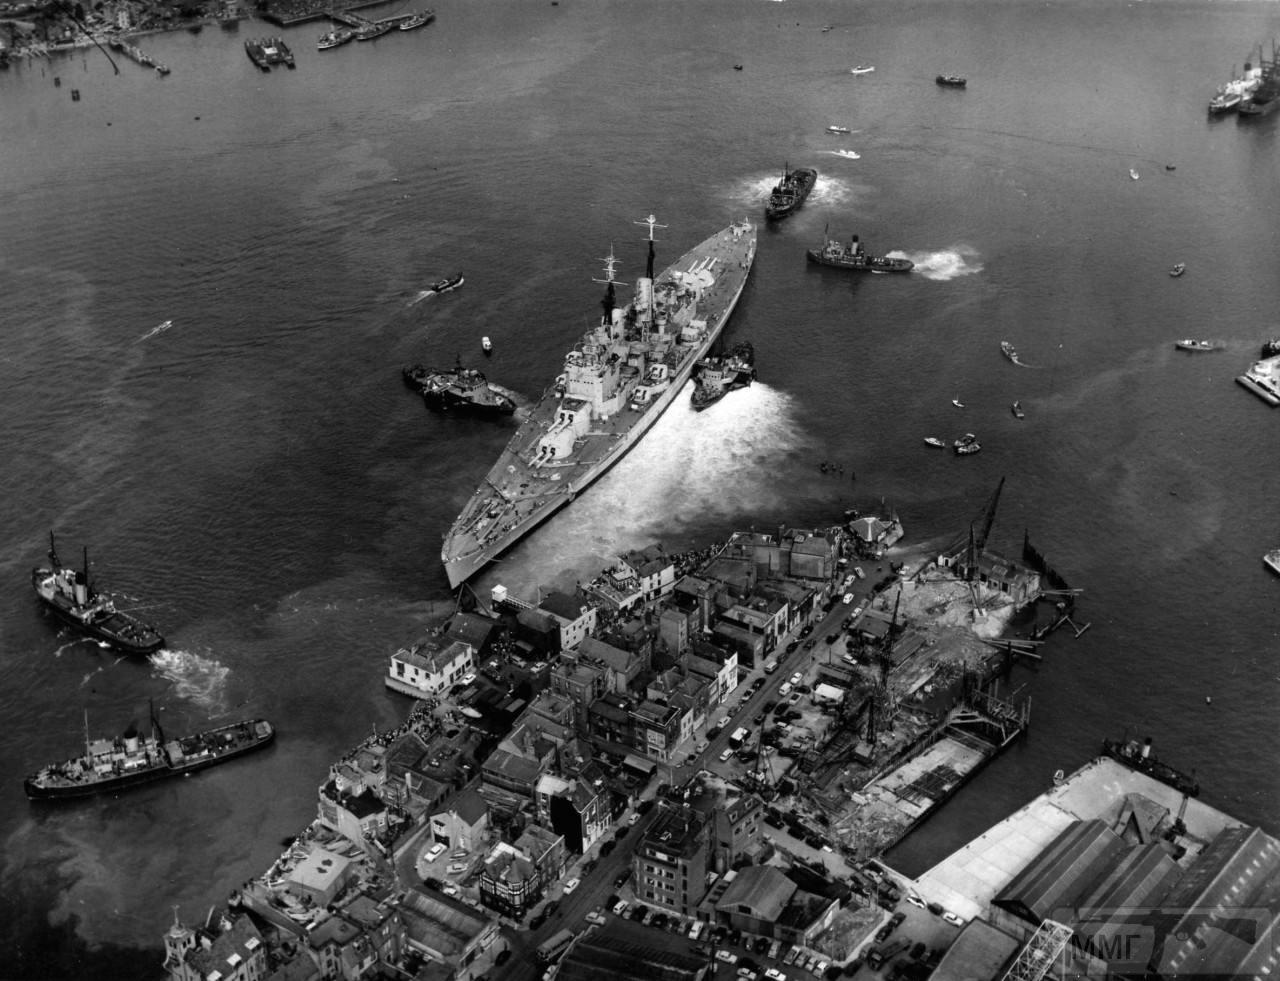 43721 - HMS Vanguard